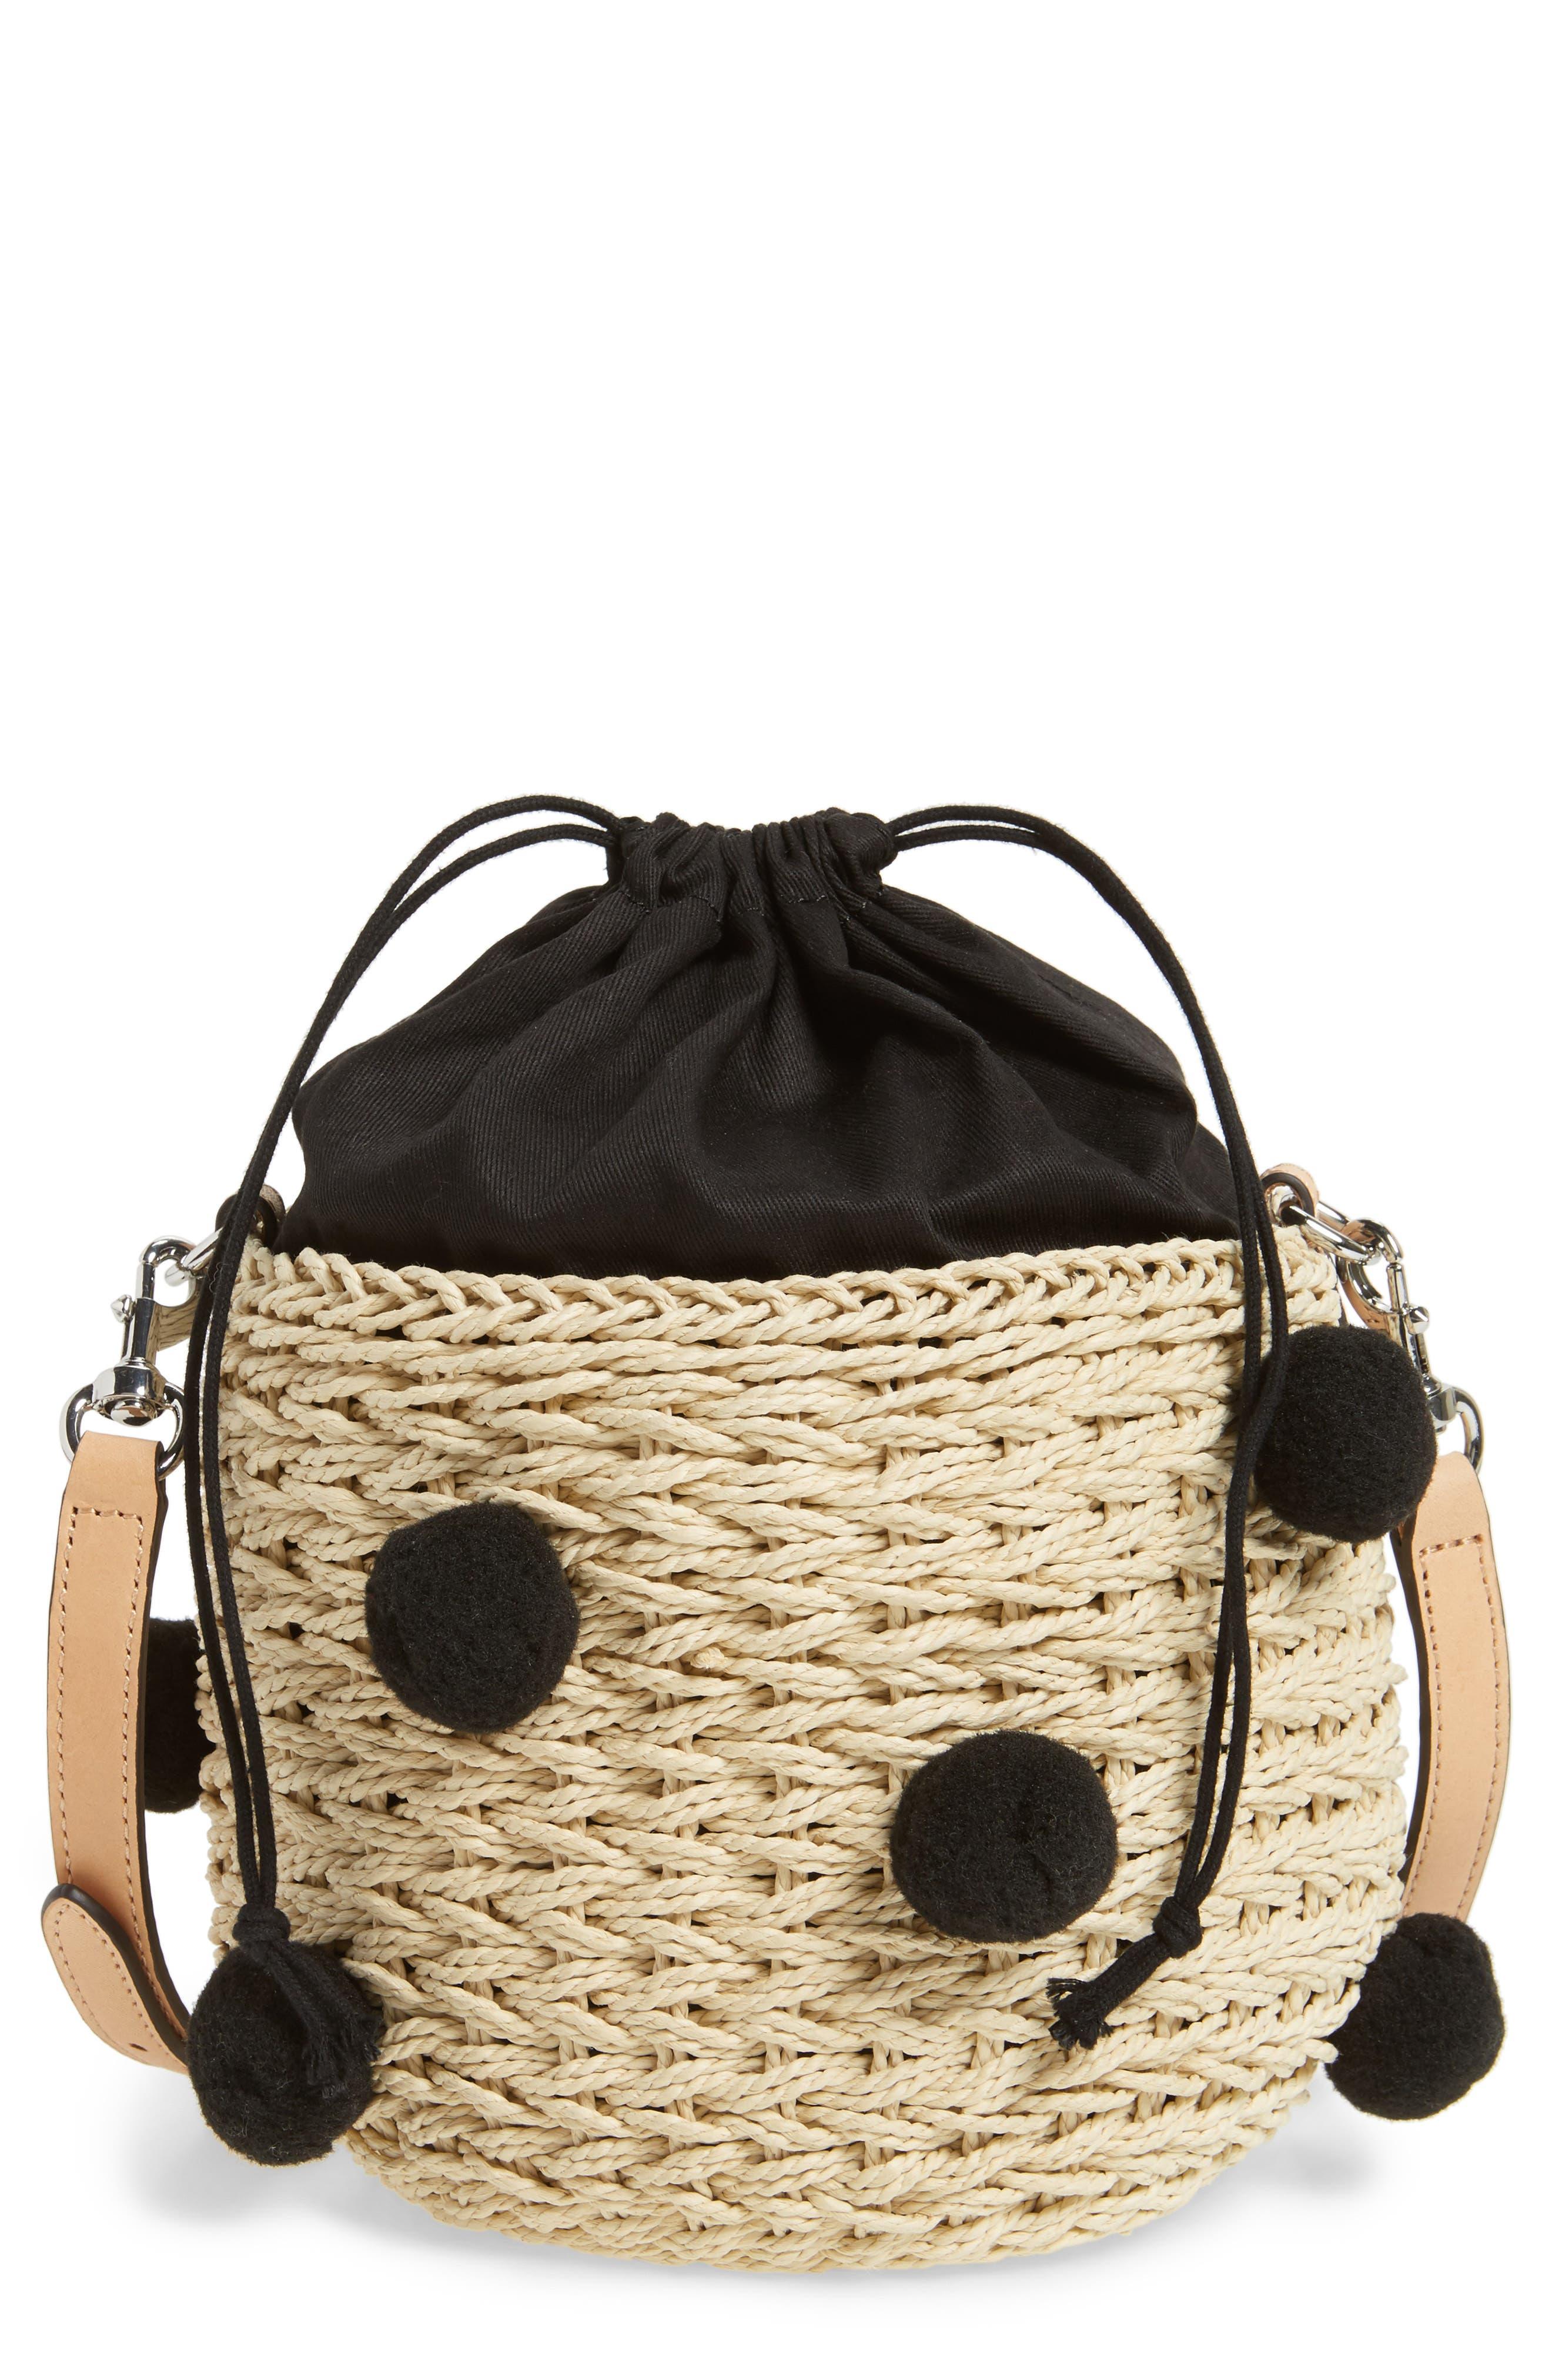 Alternate Image 1 Selected - Rebecca Minkoff Straw Pom Pom Bucket Bag